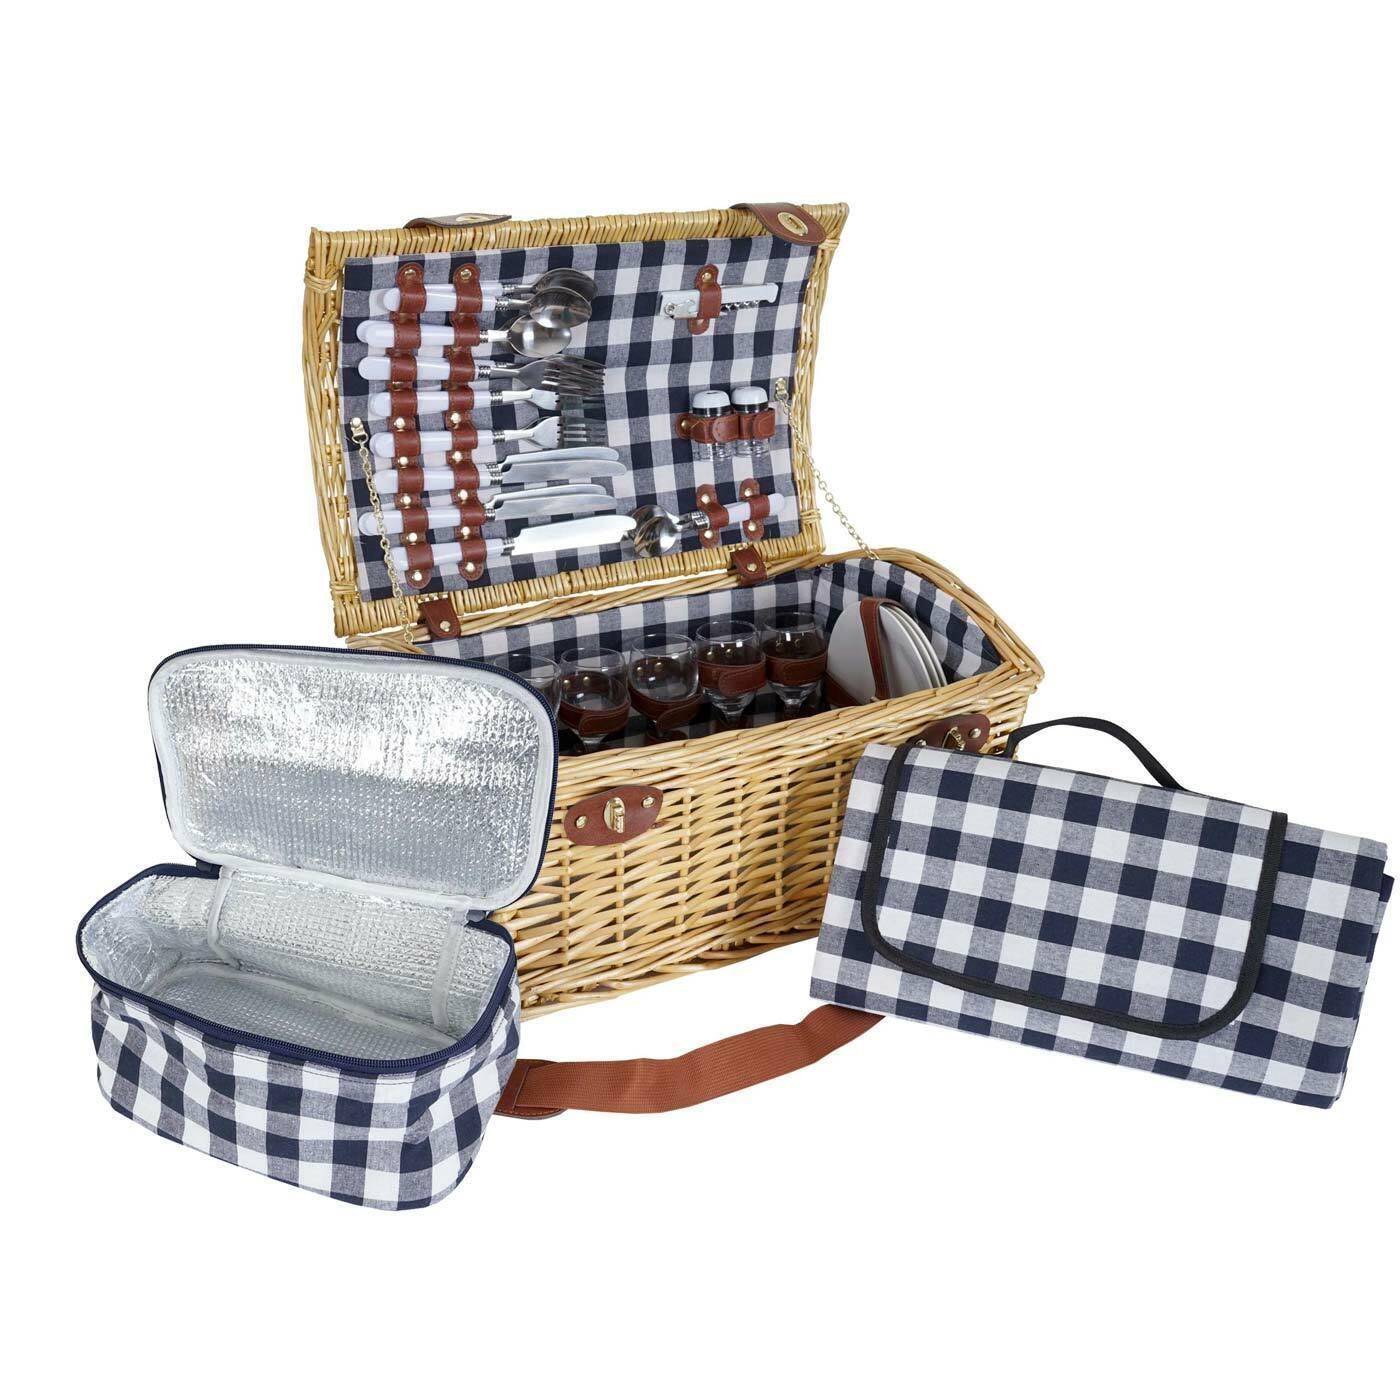 Cesta de picnic-set hwc-b23 para 6 personas, porcelana de vidrio de acero inoxidable, azul-blancoo